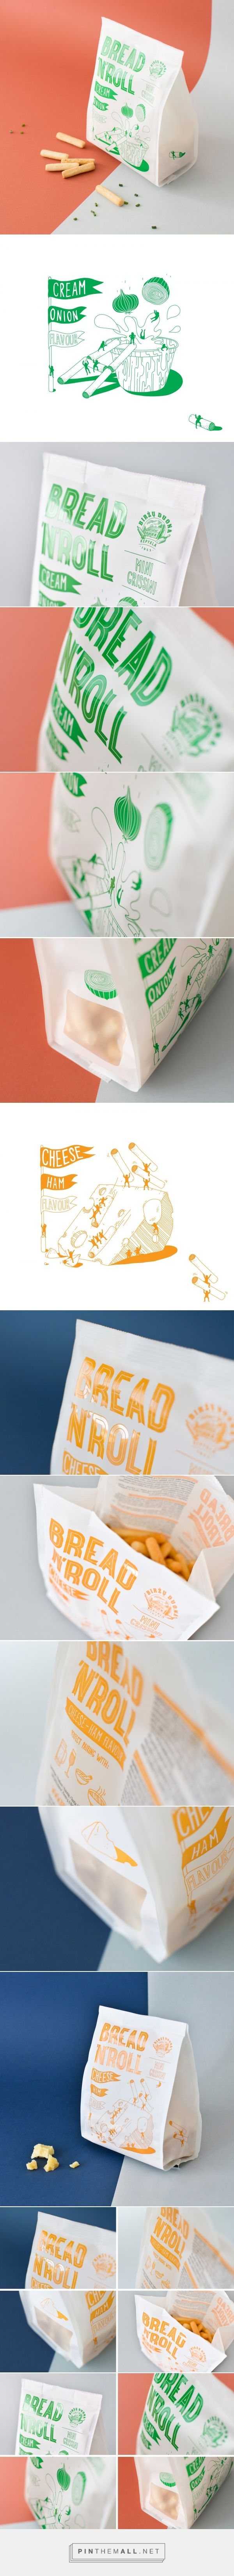 Bread'n'Roll - Packaging of the World - Creative Package Design Gallery - http://www.packagingoftheworld.com/2016/11/breadnroll.html